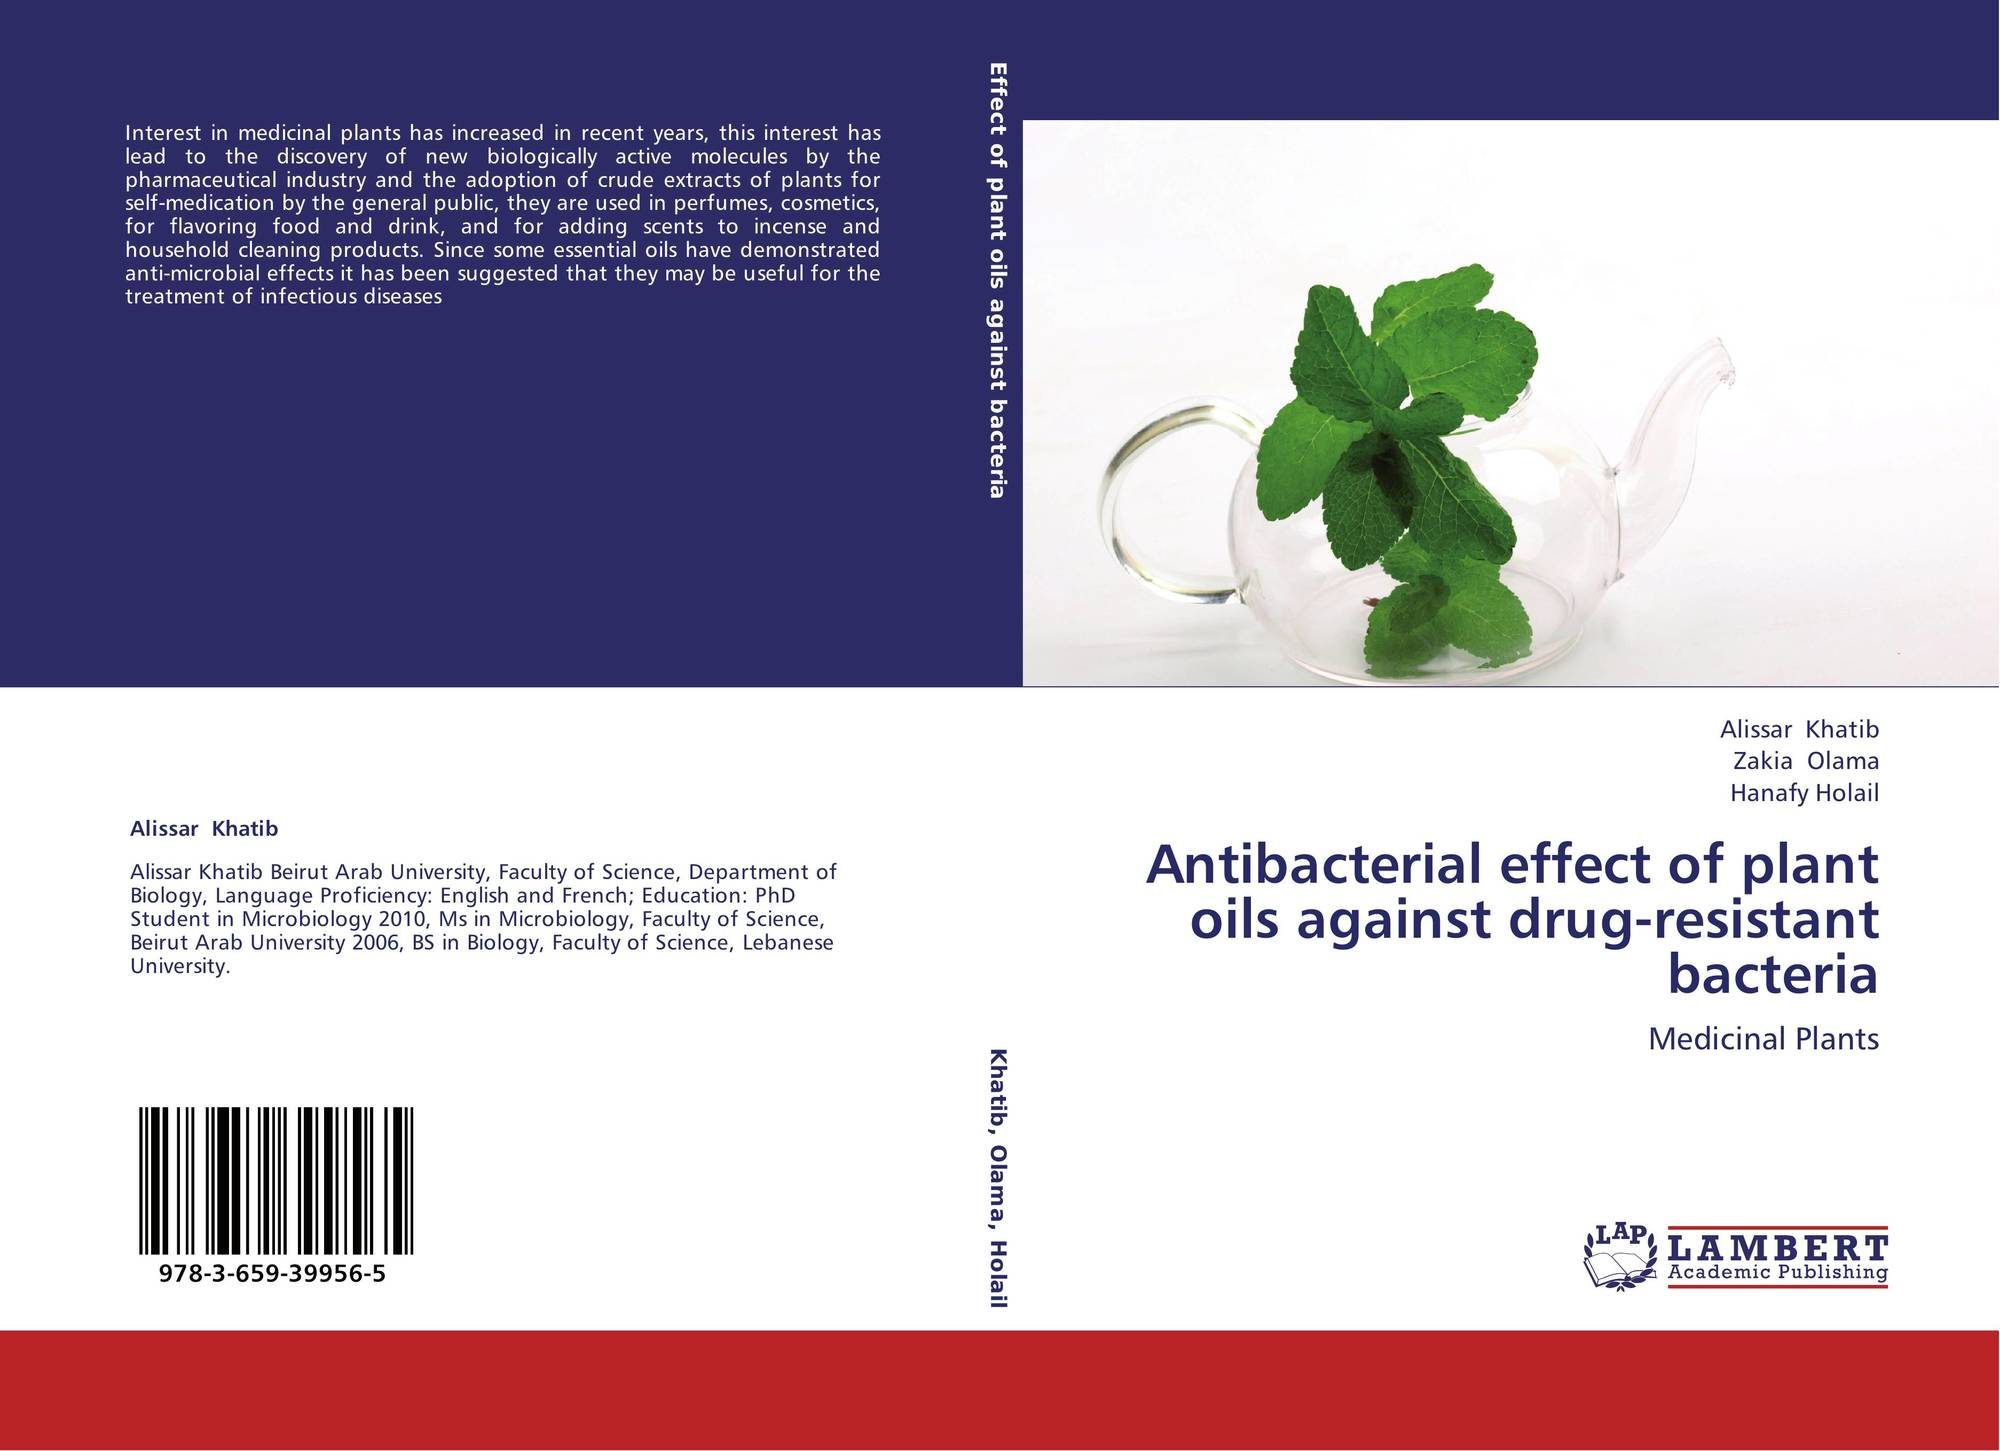 thesis - antibacterial activity of medicinal plants